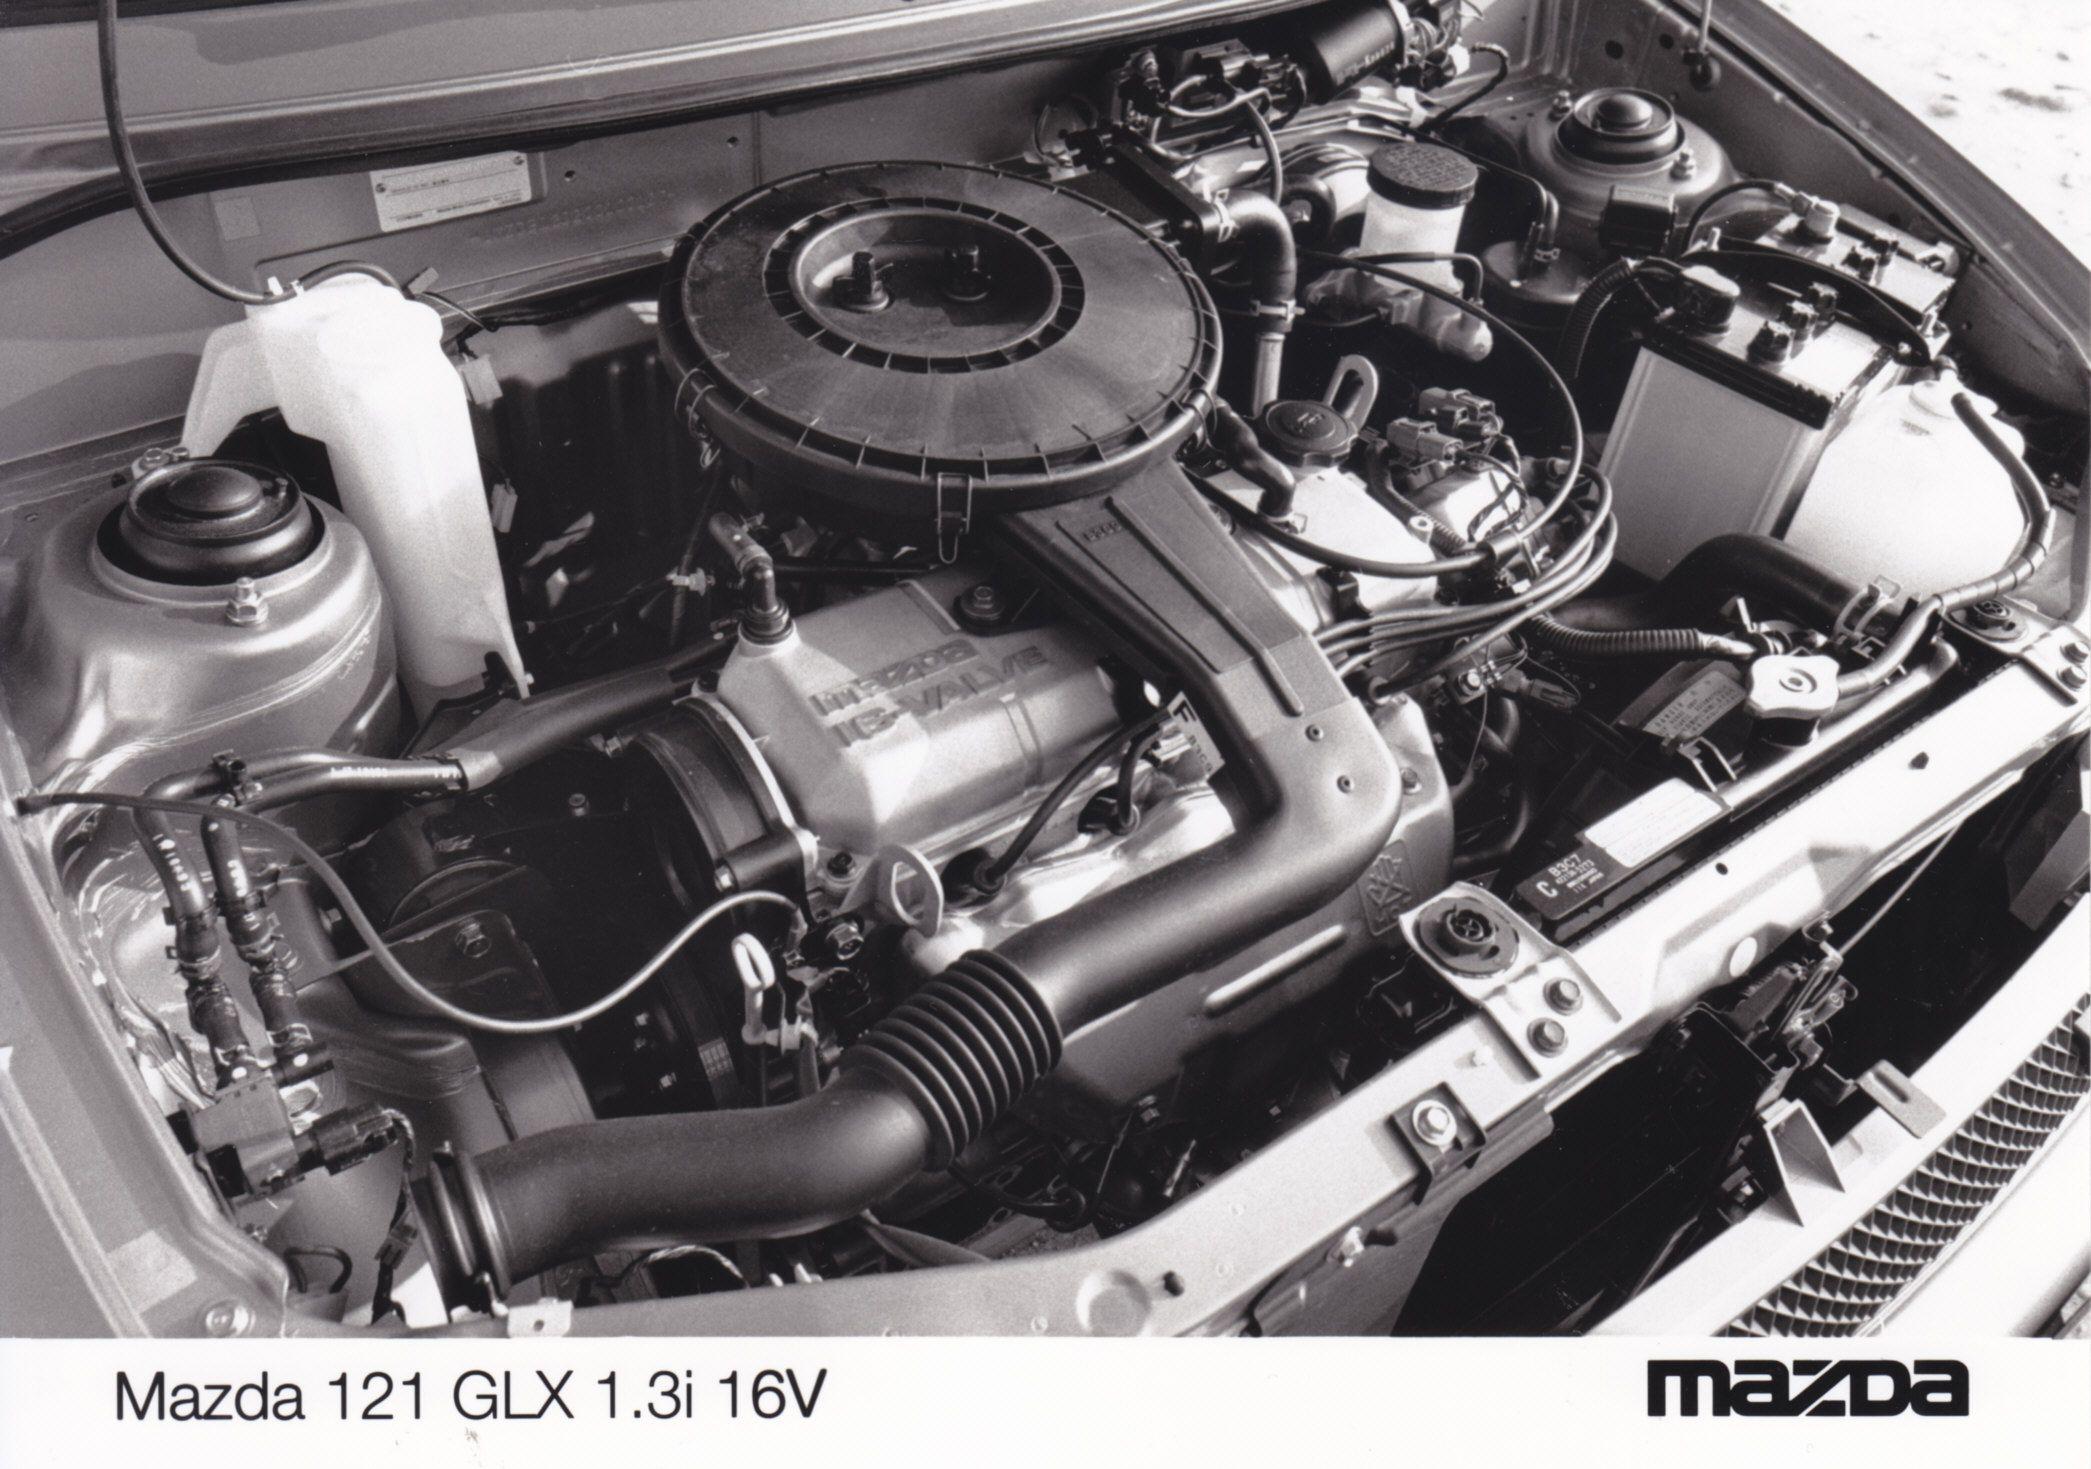 Mazda 121 GLX 1.3i 16V engine (1991)